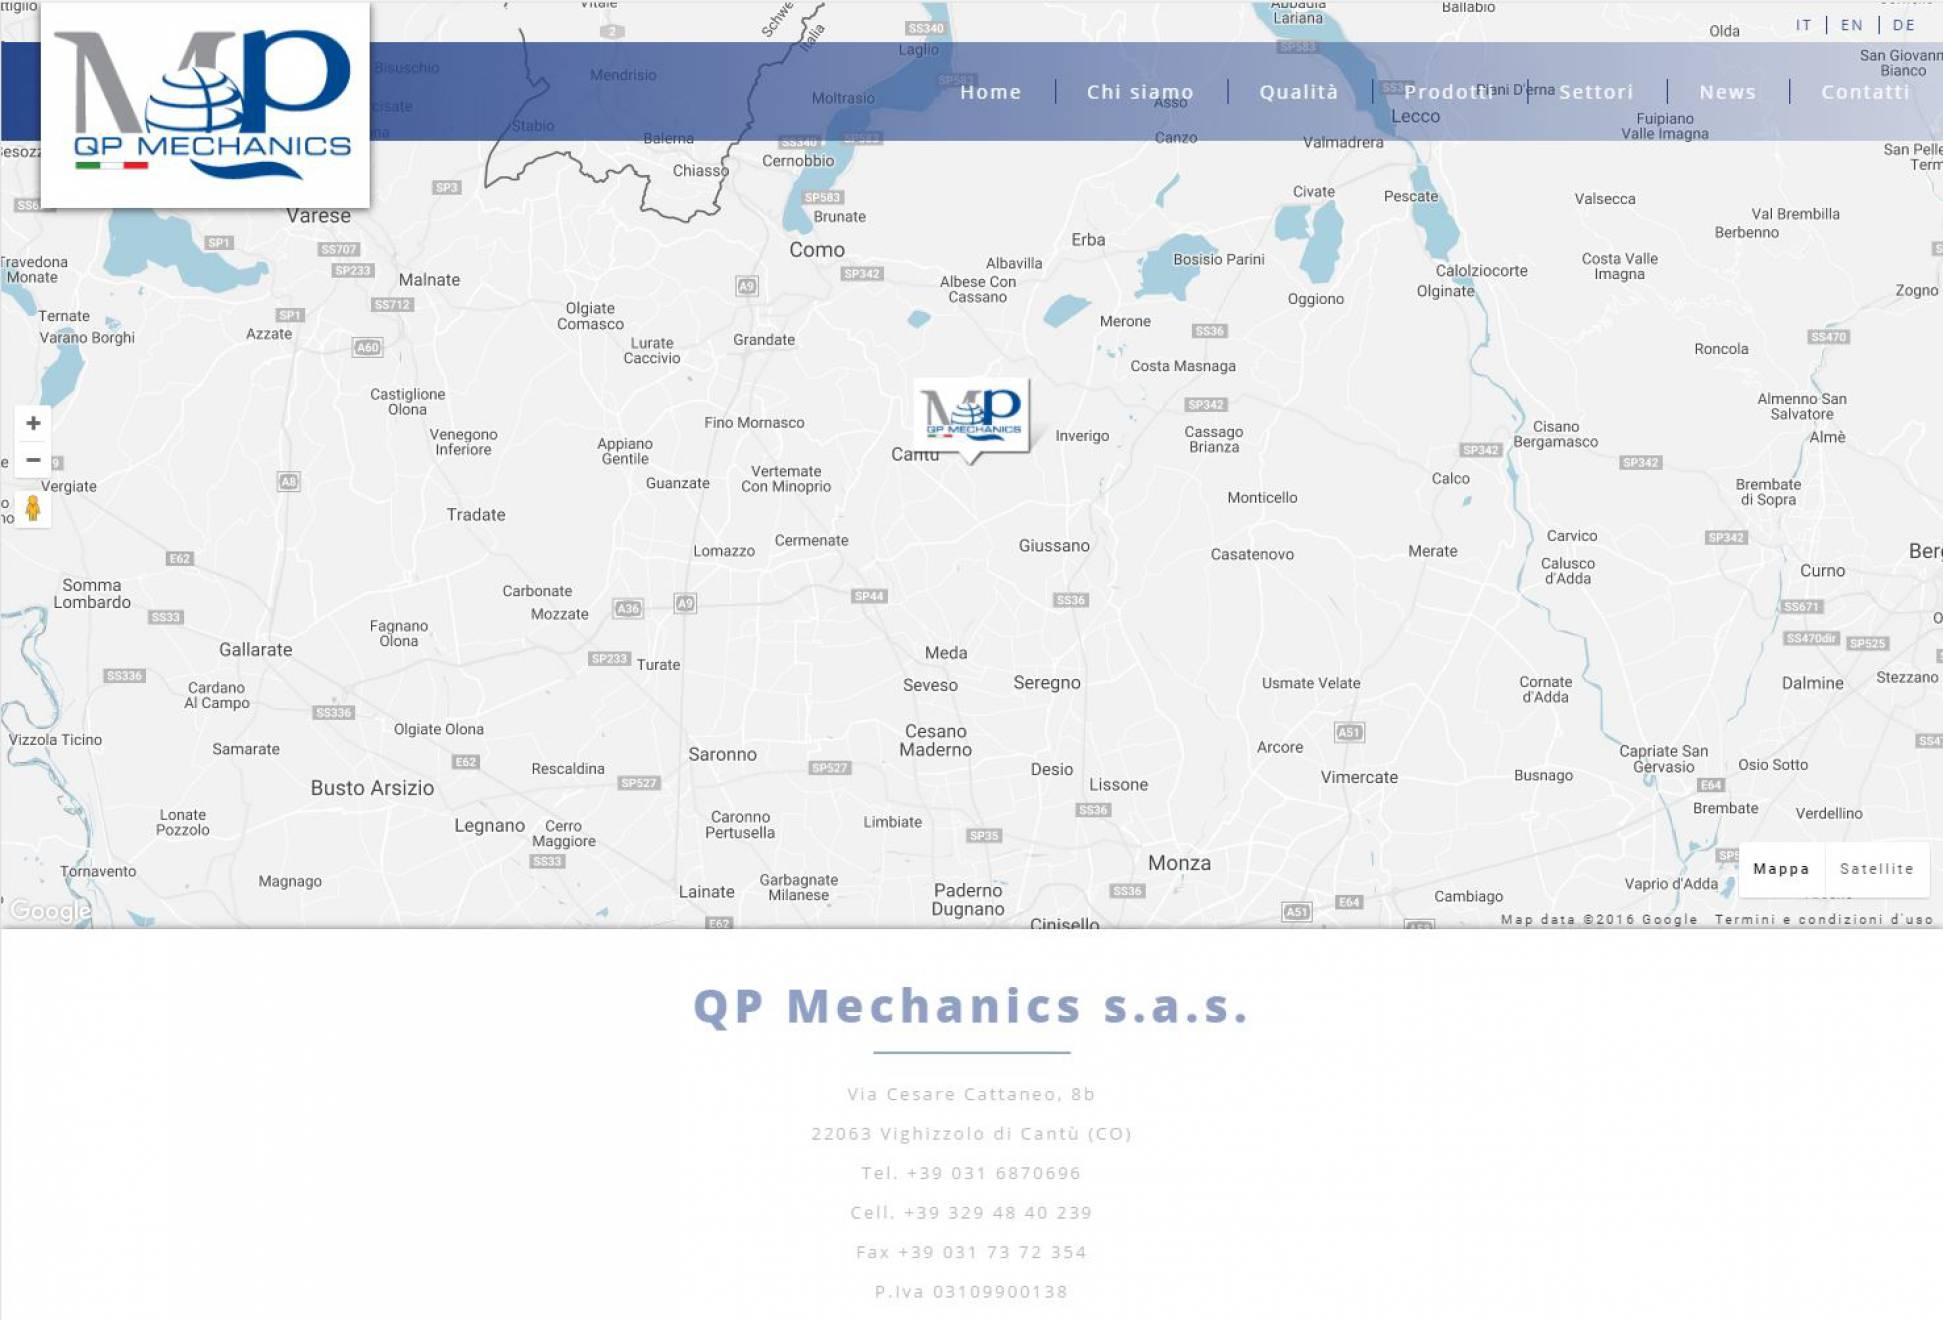 Contatti sito web responsive QP Mechanics NewVisibility